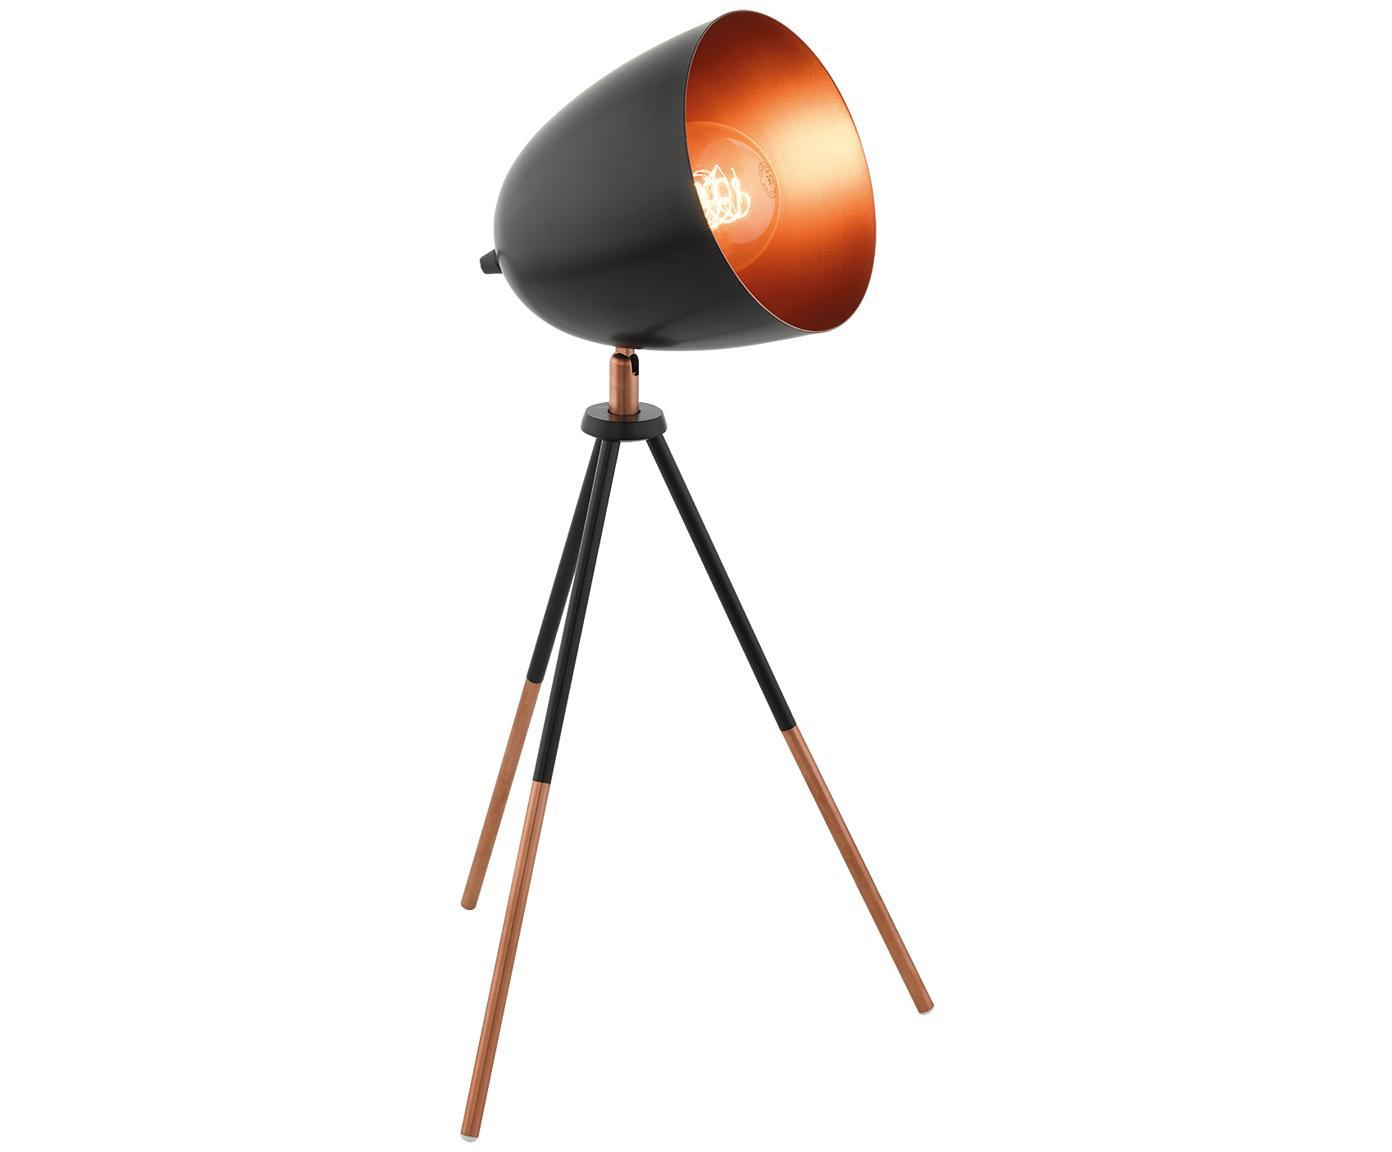 Lámpara de mesa Luna, Acero, con pintura en polvo, cobre, Base de la lámpara: negro, cobre Exterior de la pantalla: negro, An 29 x Al 44 cm